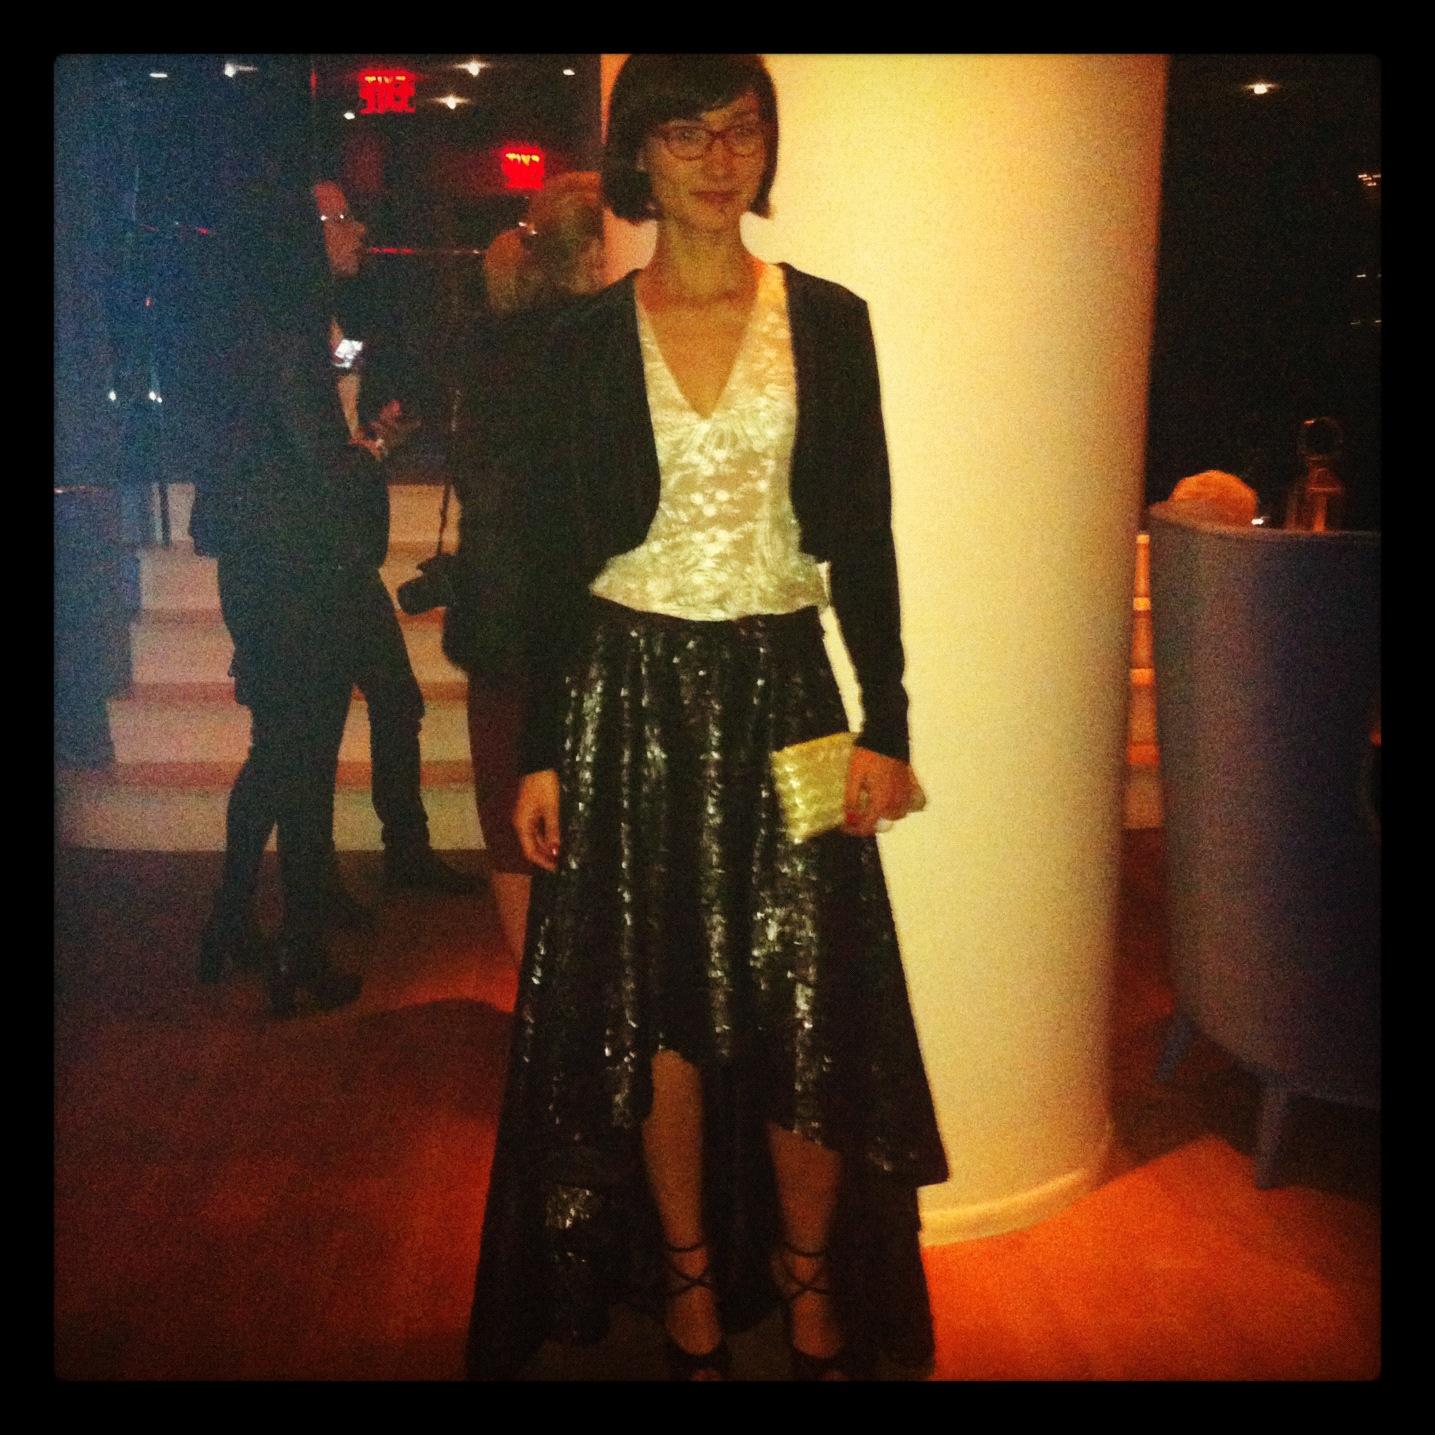 Maison Martin Margiela para H&M en New York: Red Carpet